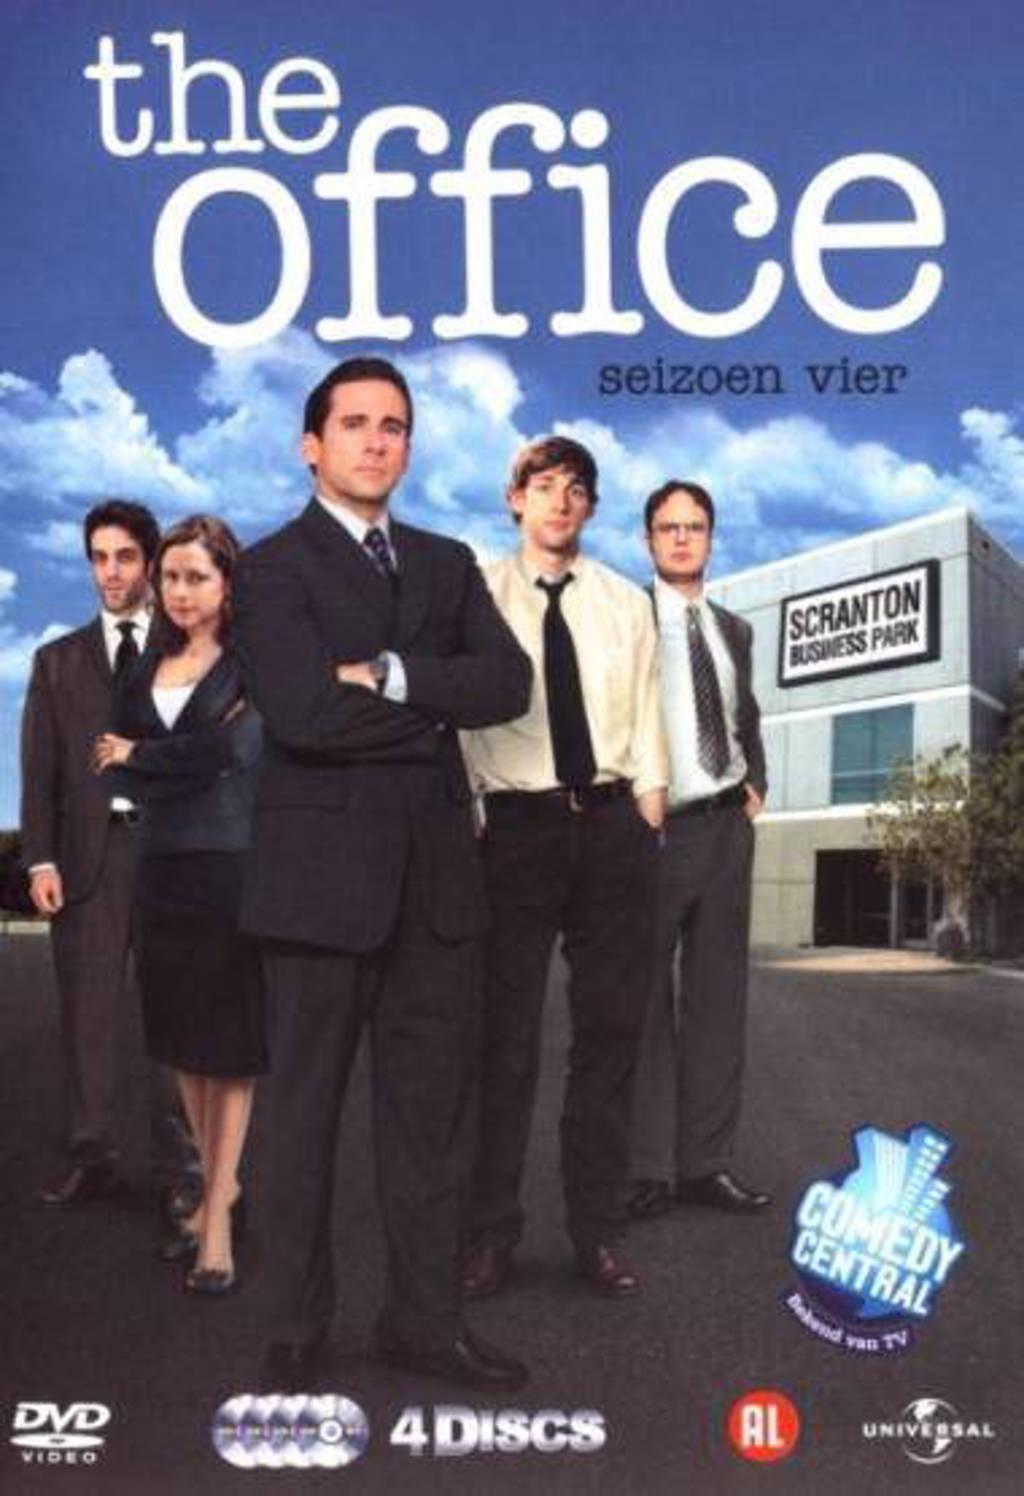 Office - Seizoen 4 (DVD)